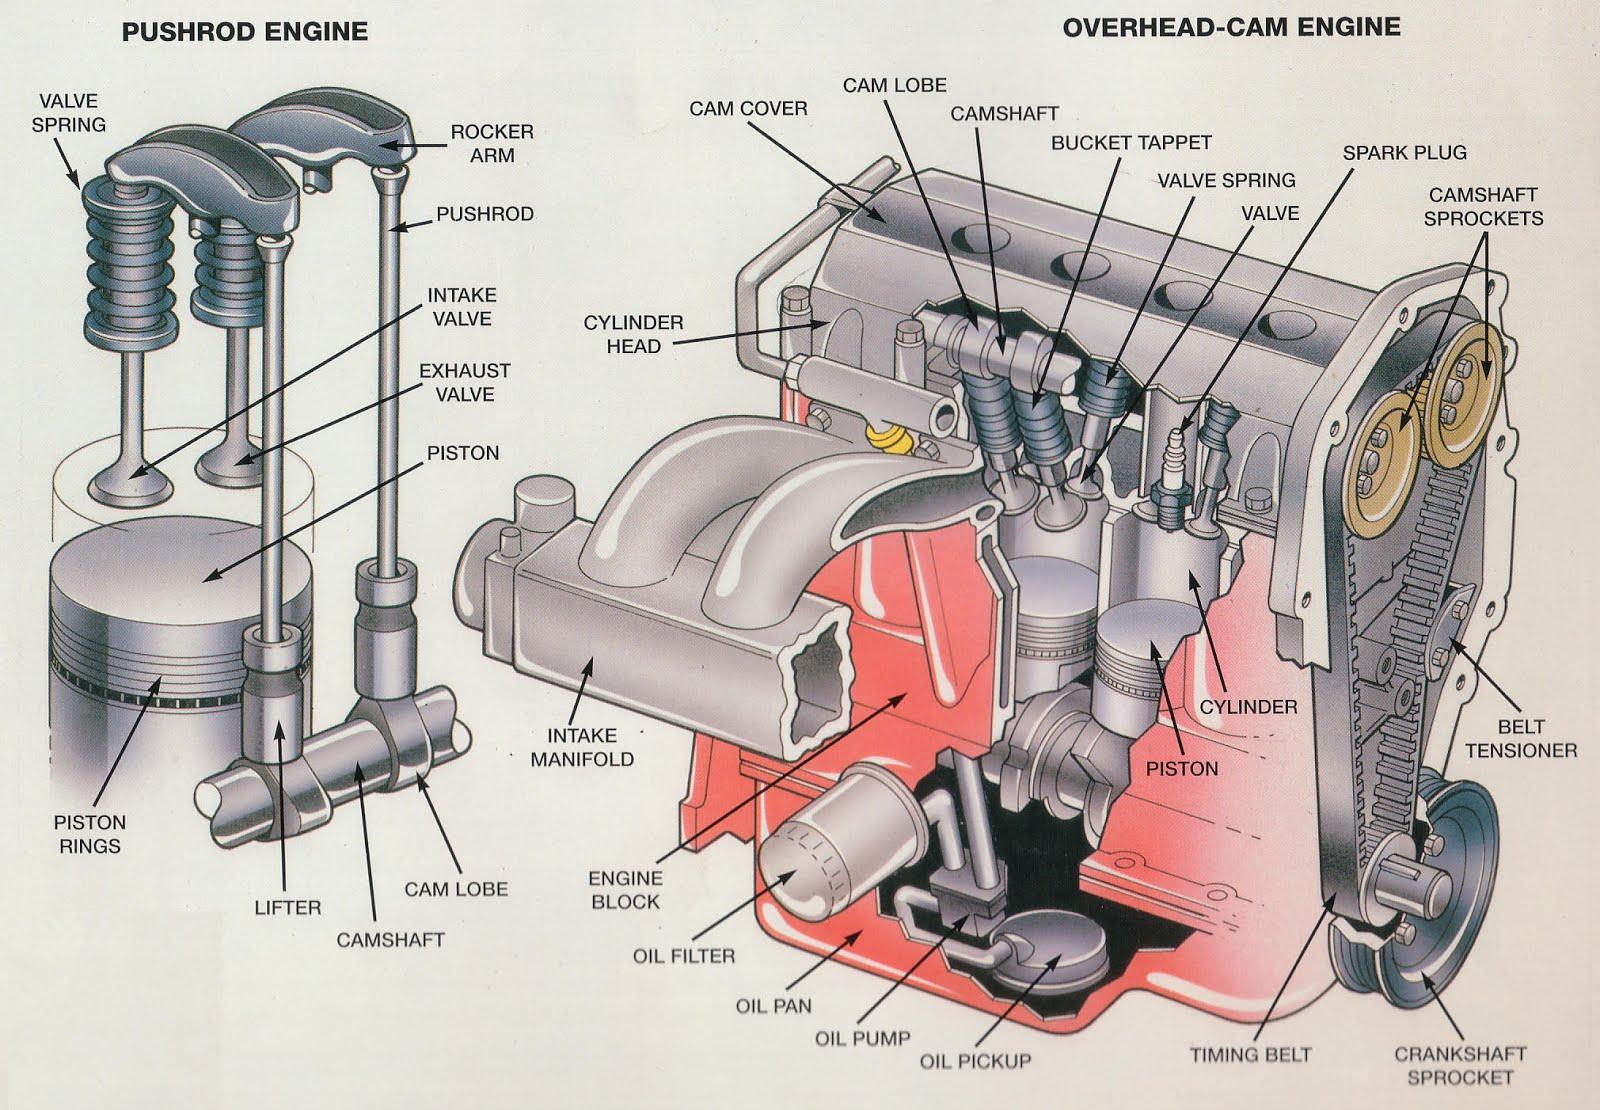 single overhead cam engine diagram cylinder piston engine flathead motor overhead valve engine diagram [ 1600 x 1110 Pixel ]